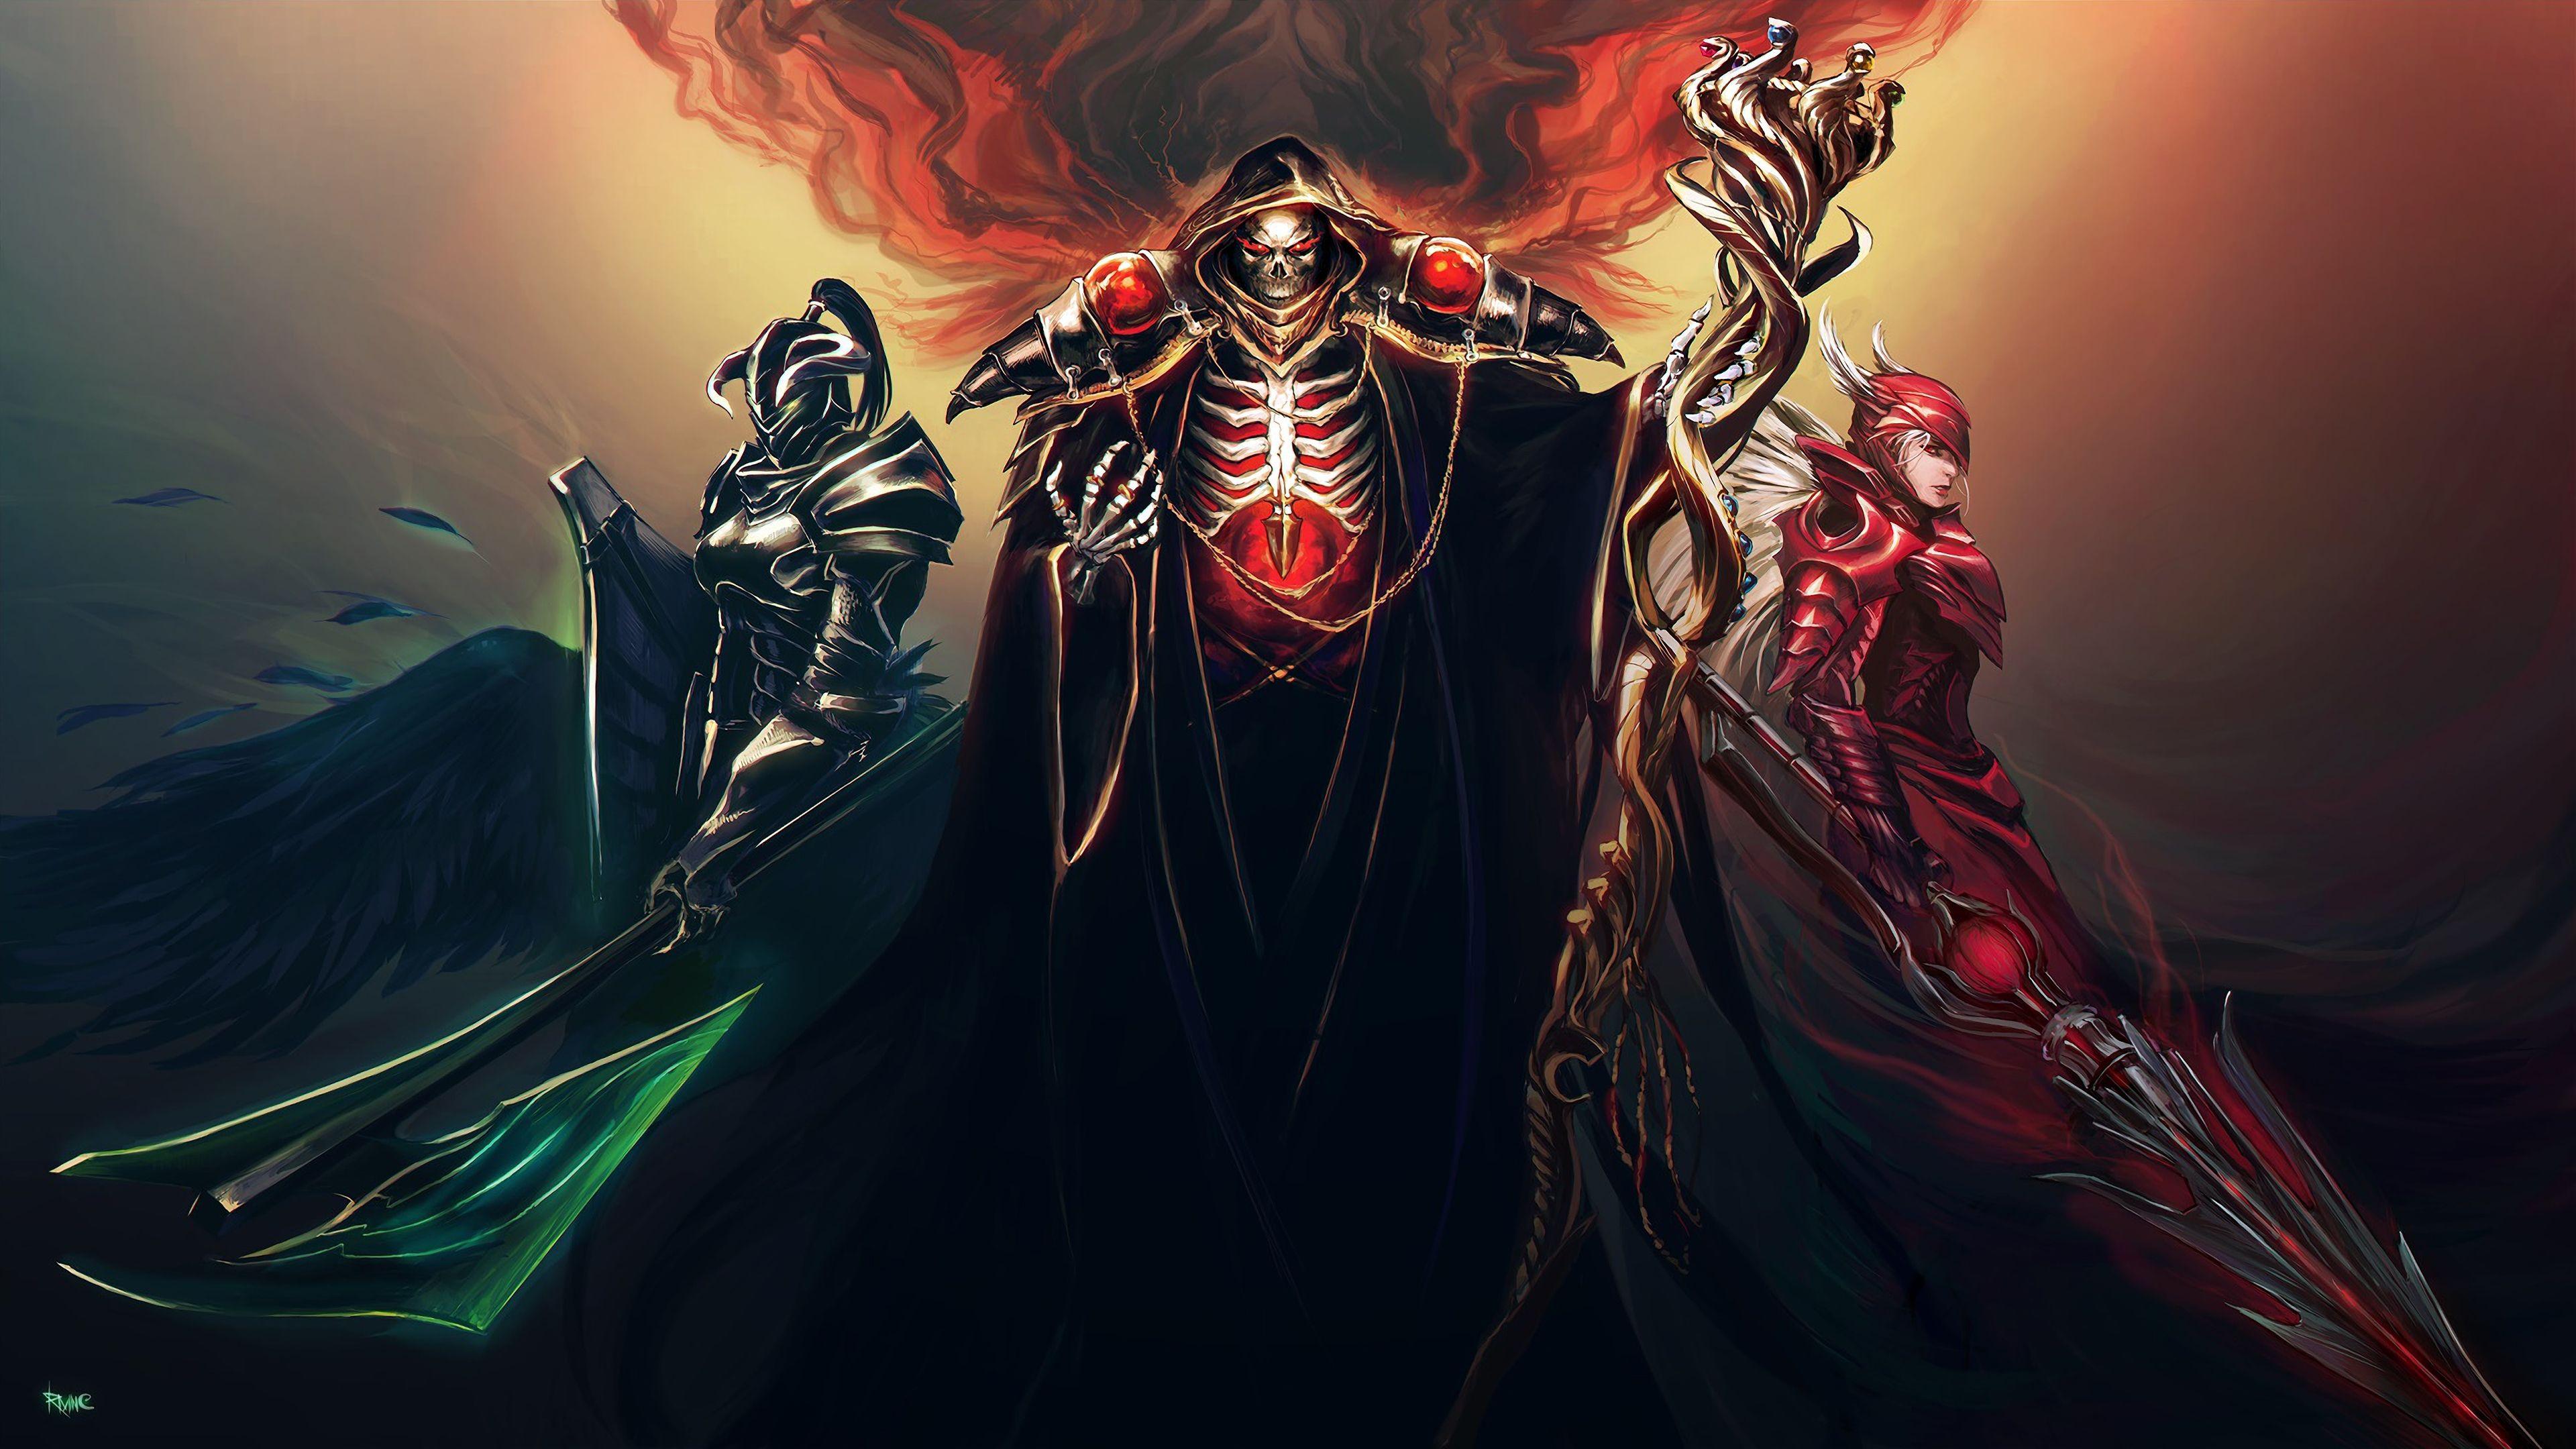 Overlord Anime Ainz Ooal Gown Albedo Shalltear Bloodfallen Knight 3840x2160 Wallpaper Albedo Anime Anime Fanart